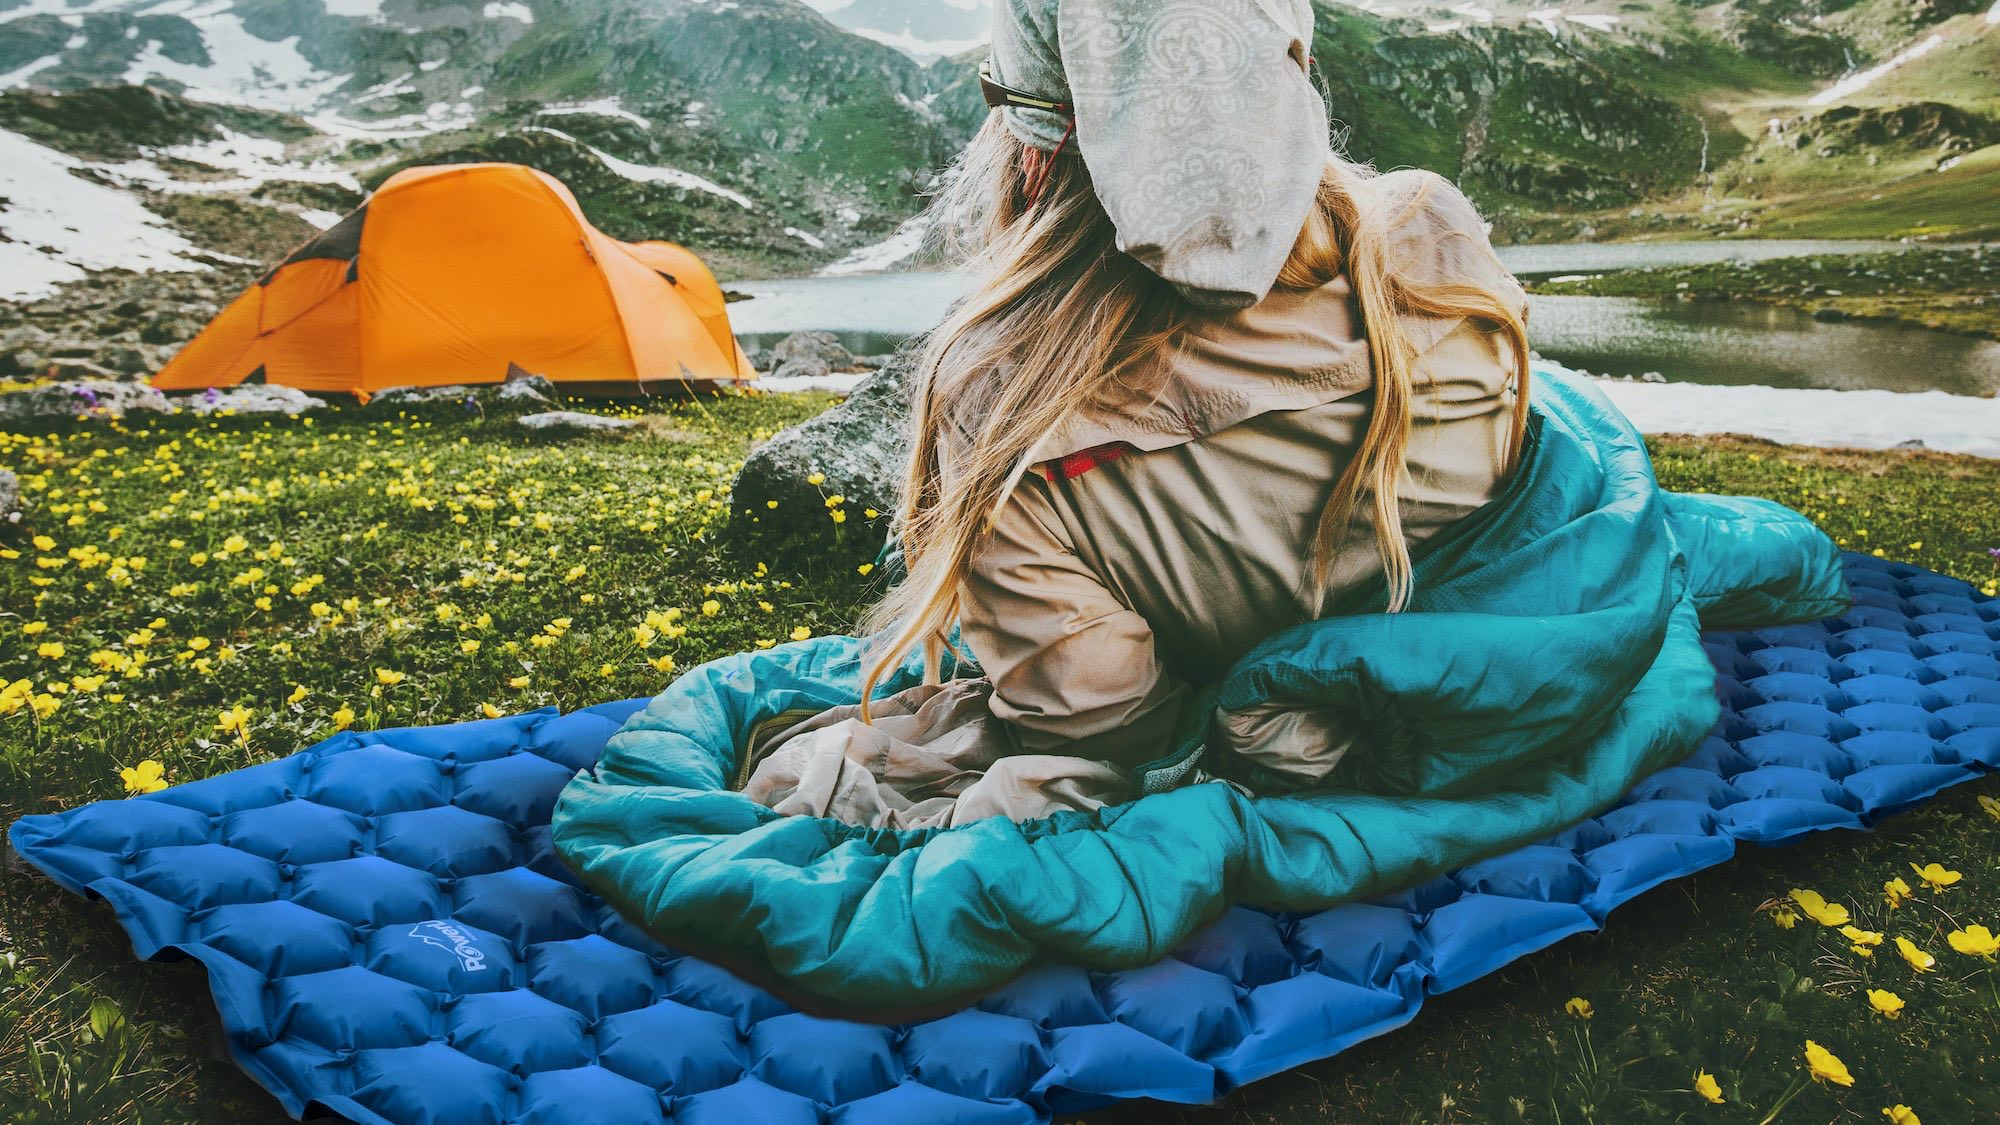 POWERLIX ultralight sleeping pad uses body mapping technology